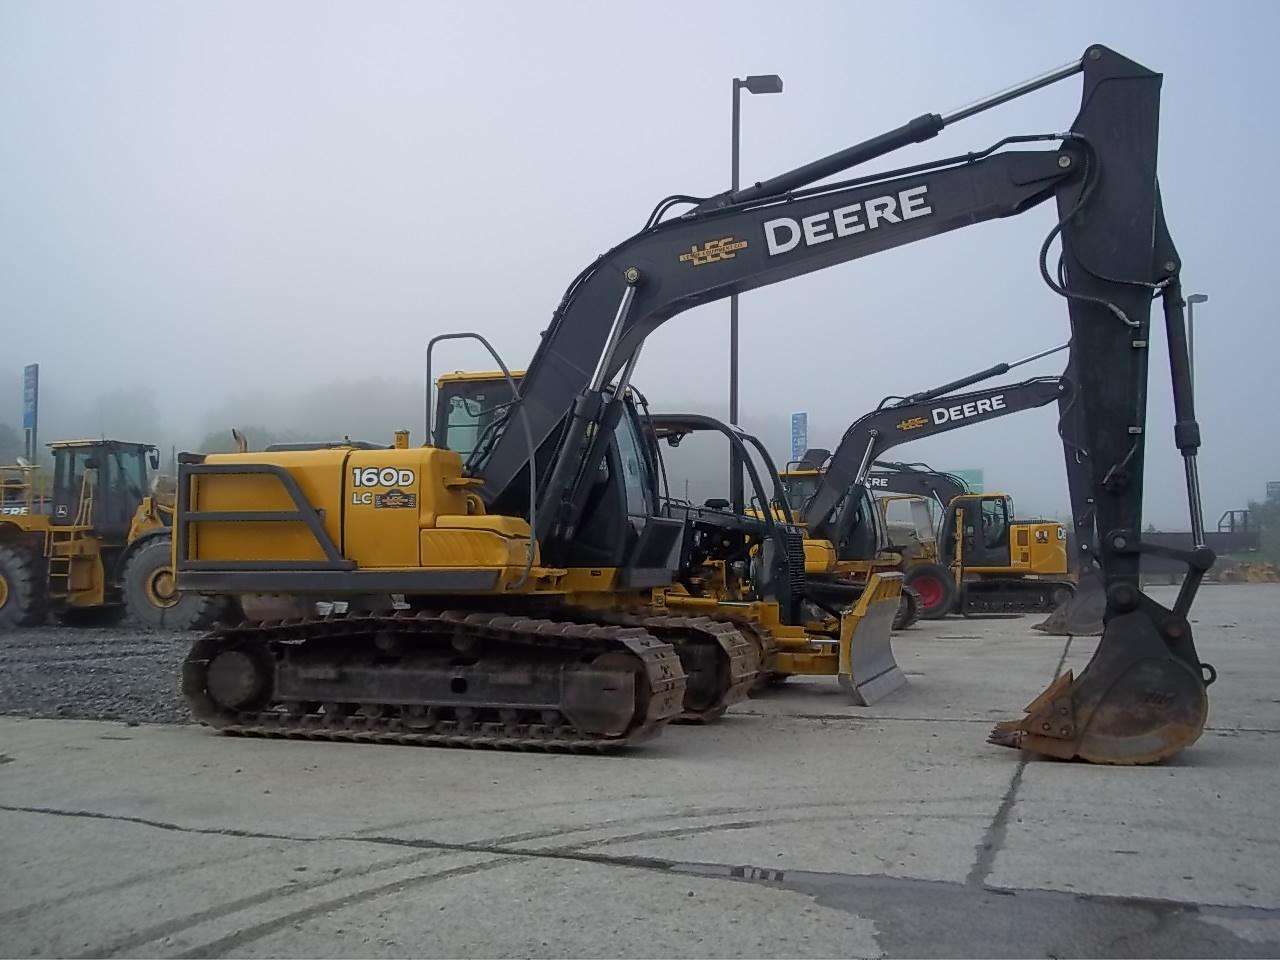 John Deere 200 Dlc Excavator submited images.